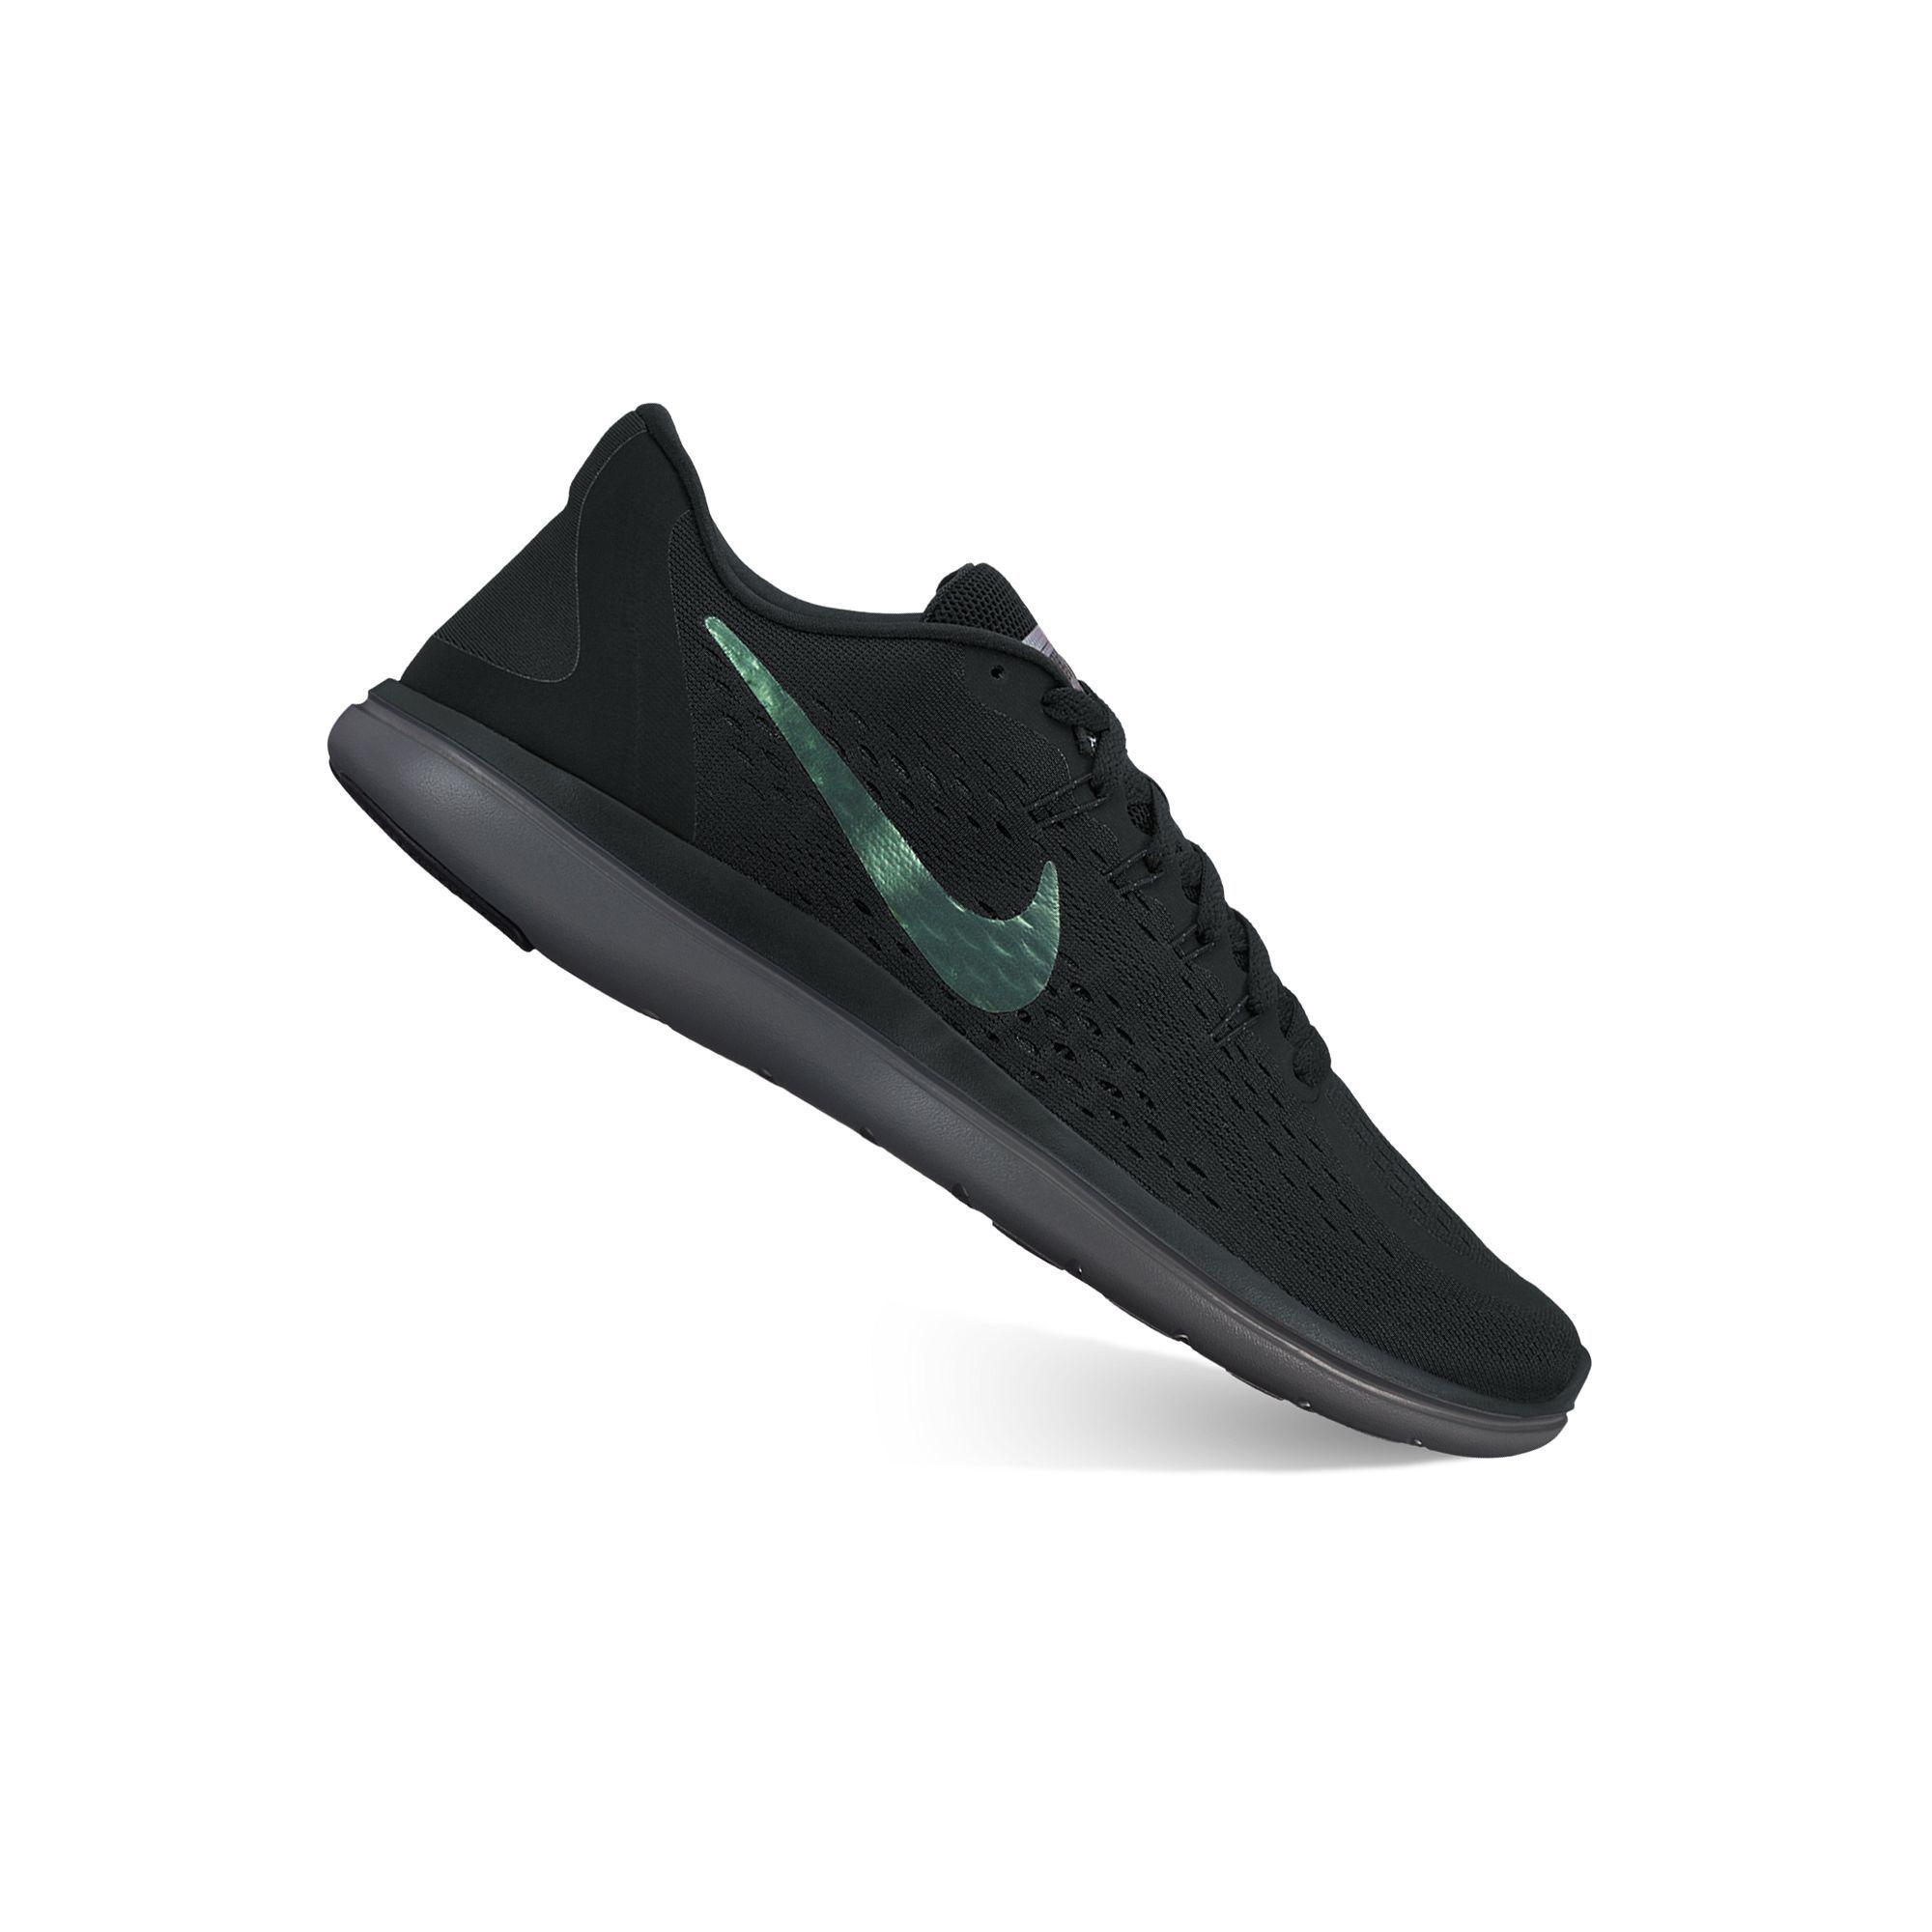 2017 ShoesProducts Sense Bts Flex Nike Y Men's Tenis Rn Running jUVSGzLMqp